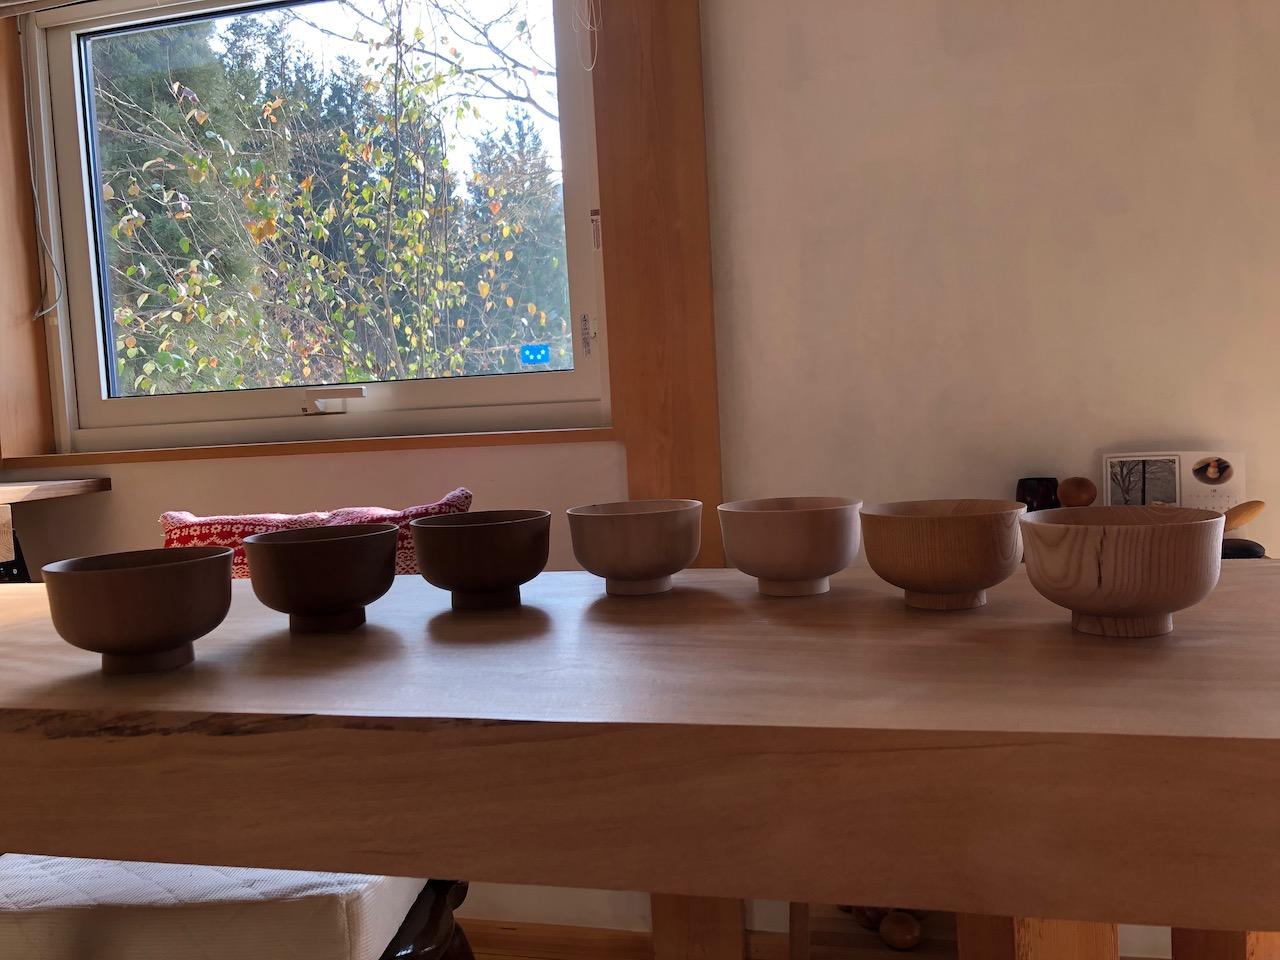 Erina Woodenbowl Studio